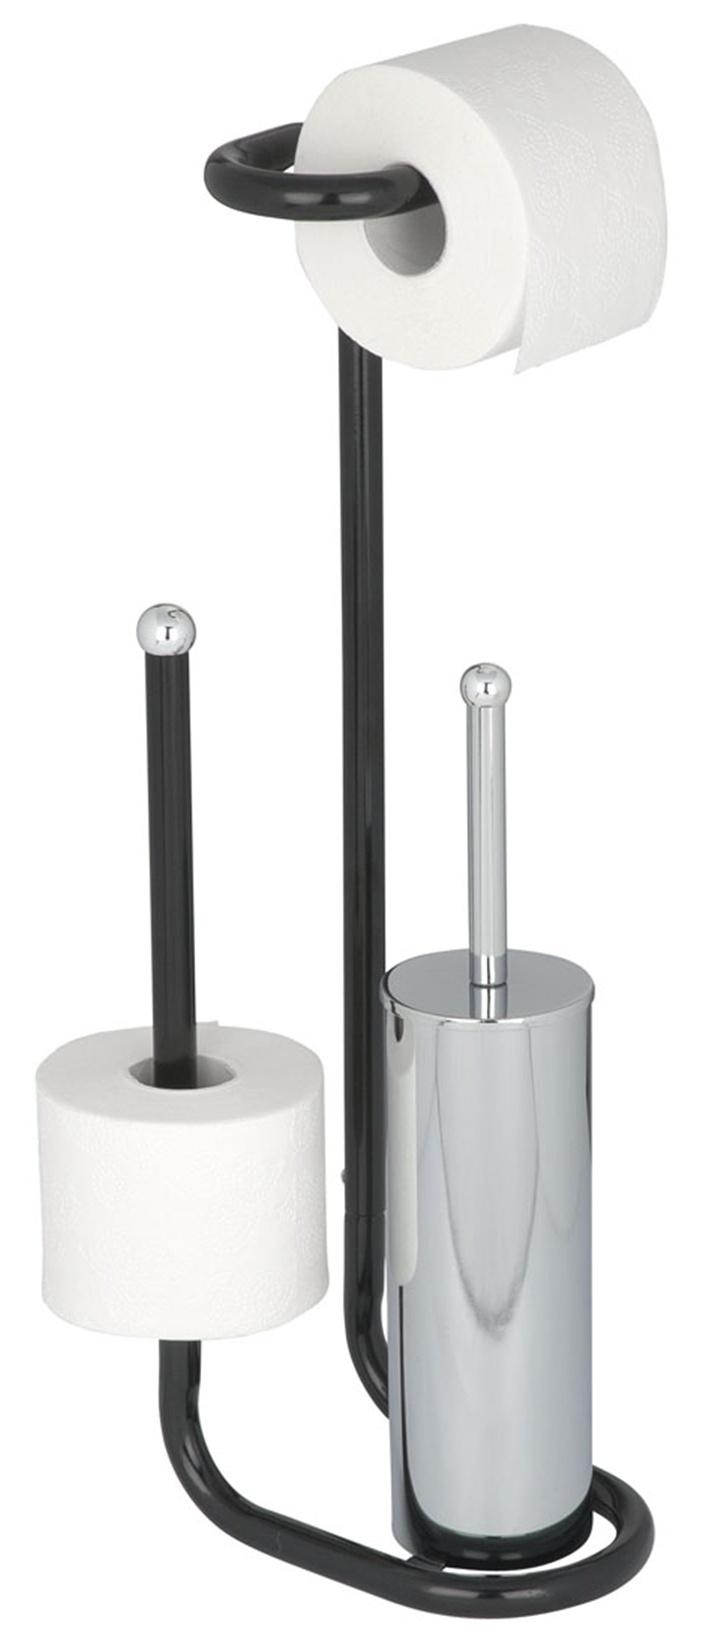 stand wc garnitur st nder b rstenhalter toilettenpapier. Black Bedroom Furniture Sets. Home Design Ideas